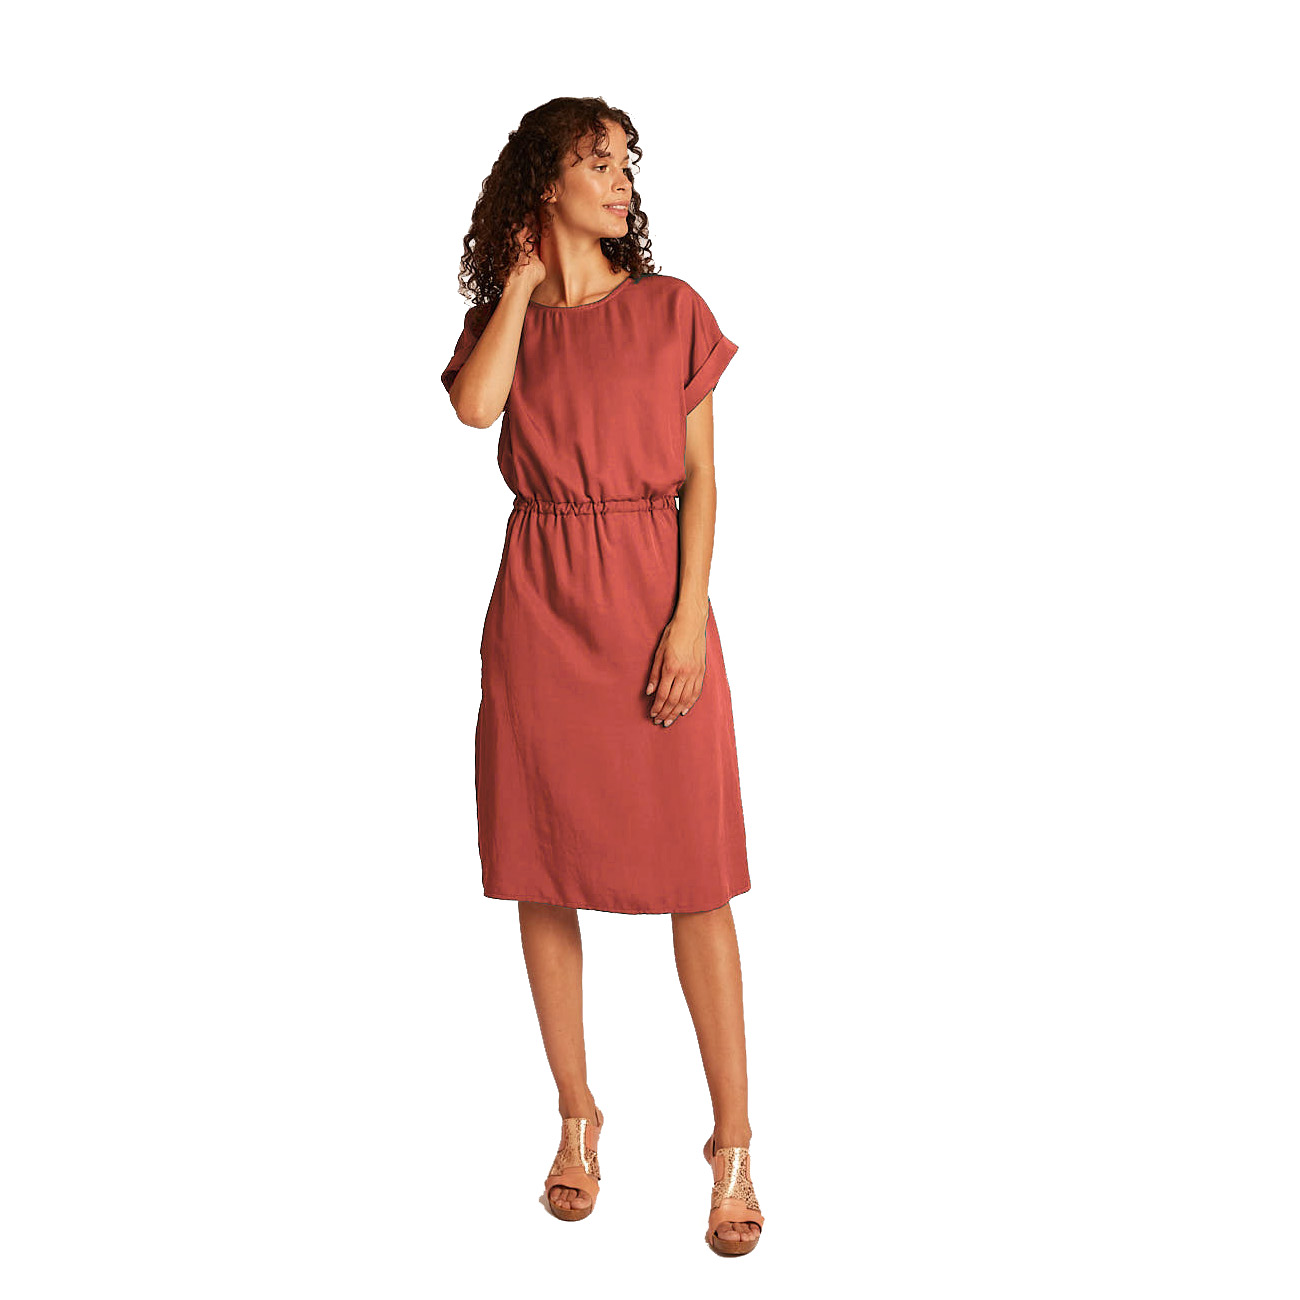 Lassiges Kleid Vanka In Rot Mit Gummizug